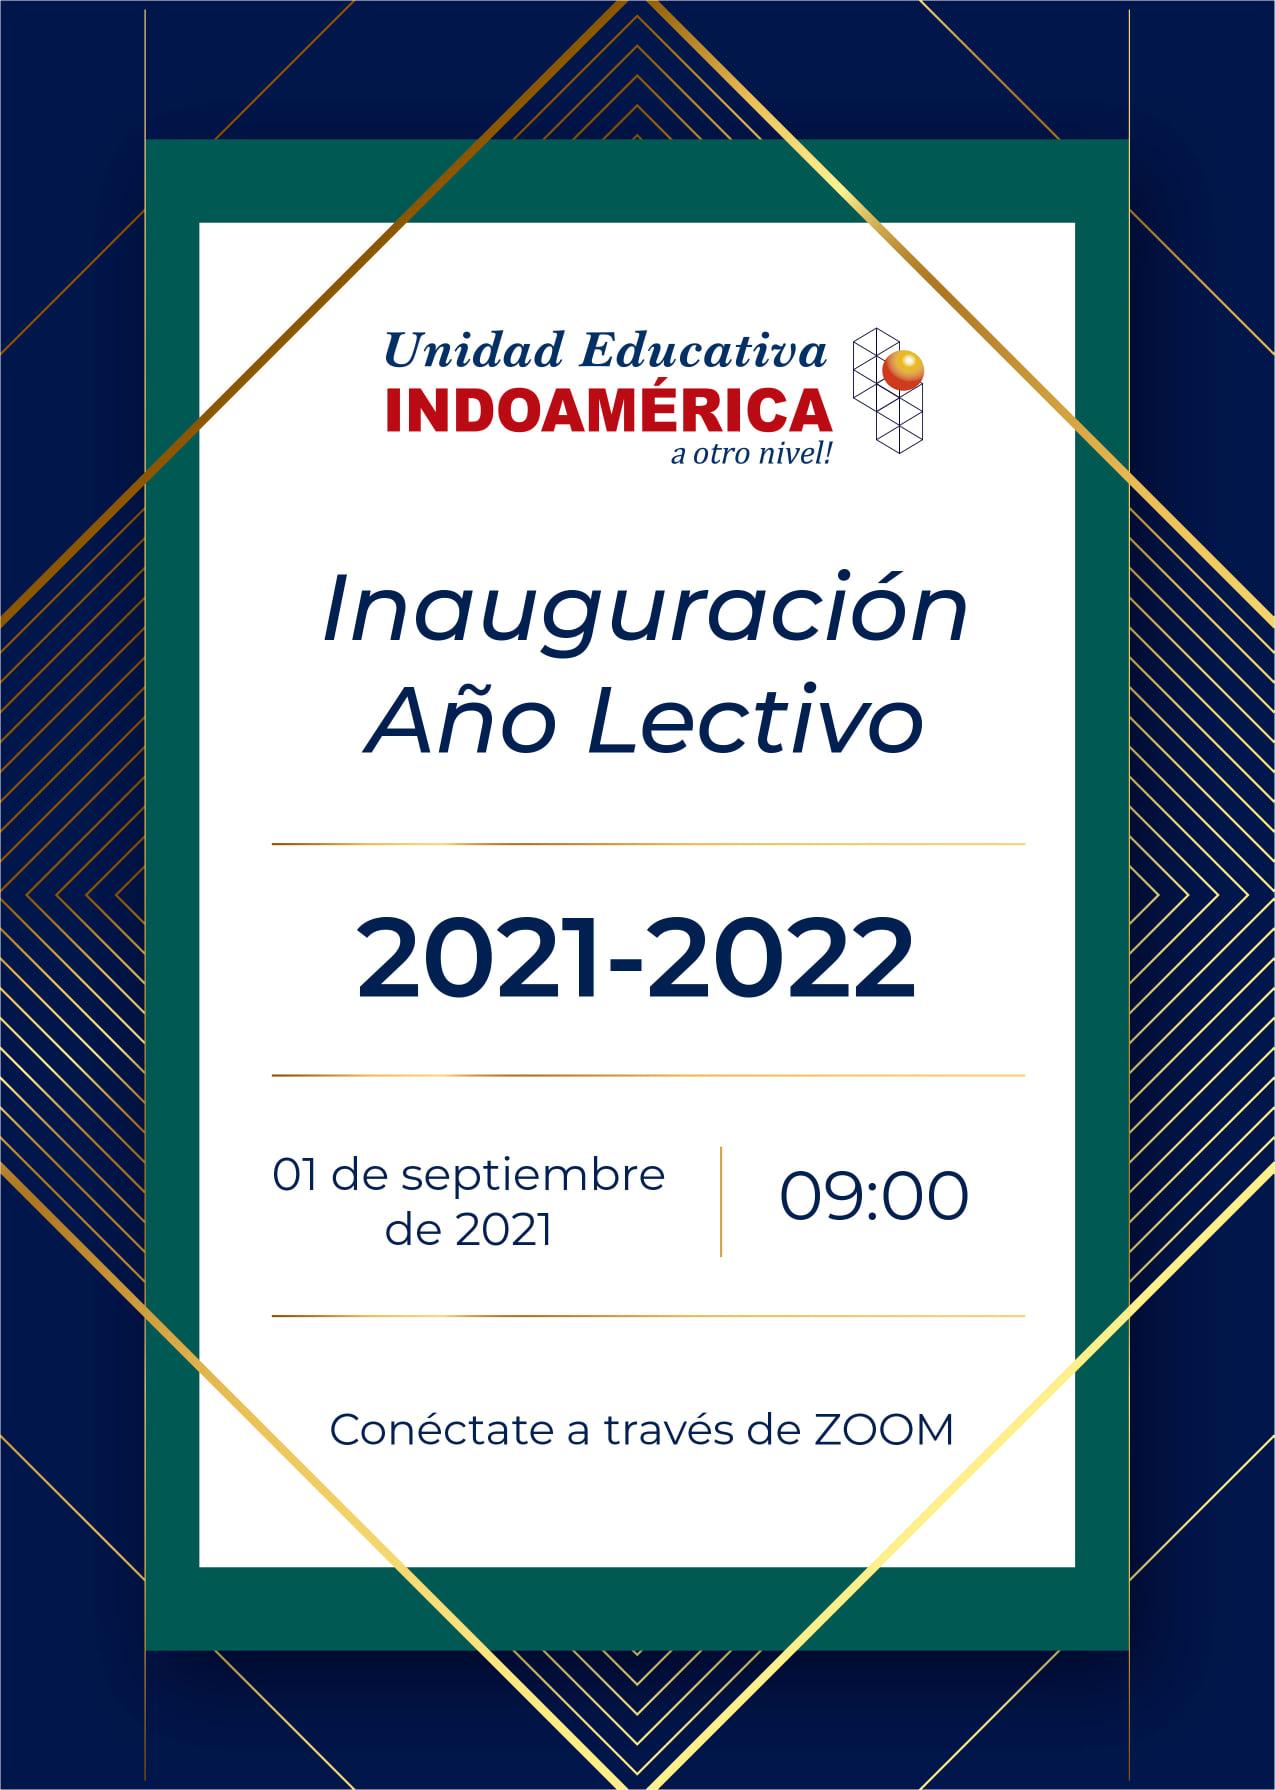 Inauguración Año Lectivo 2021-2022